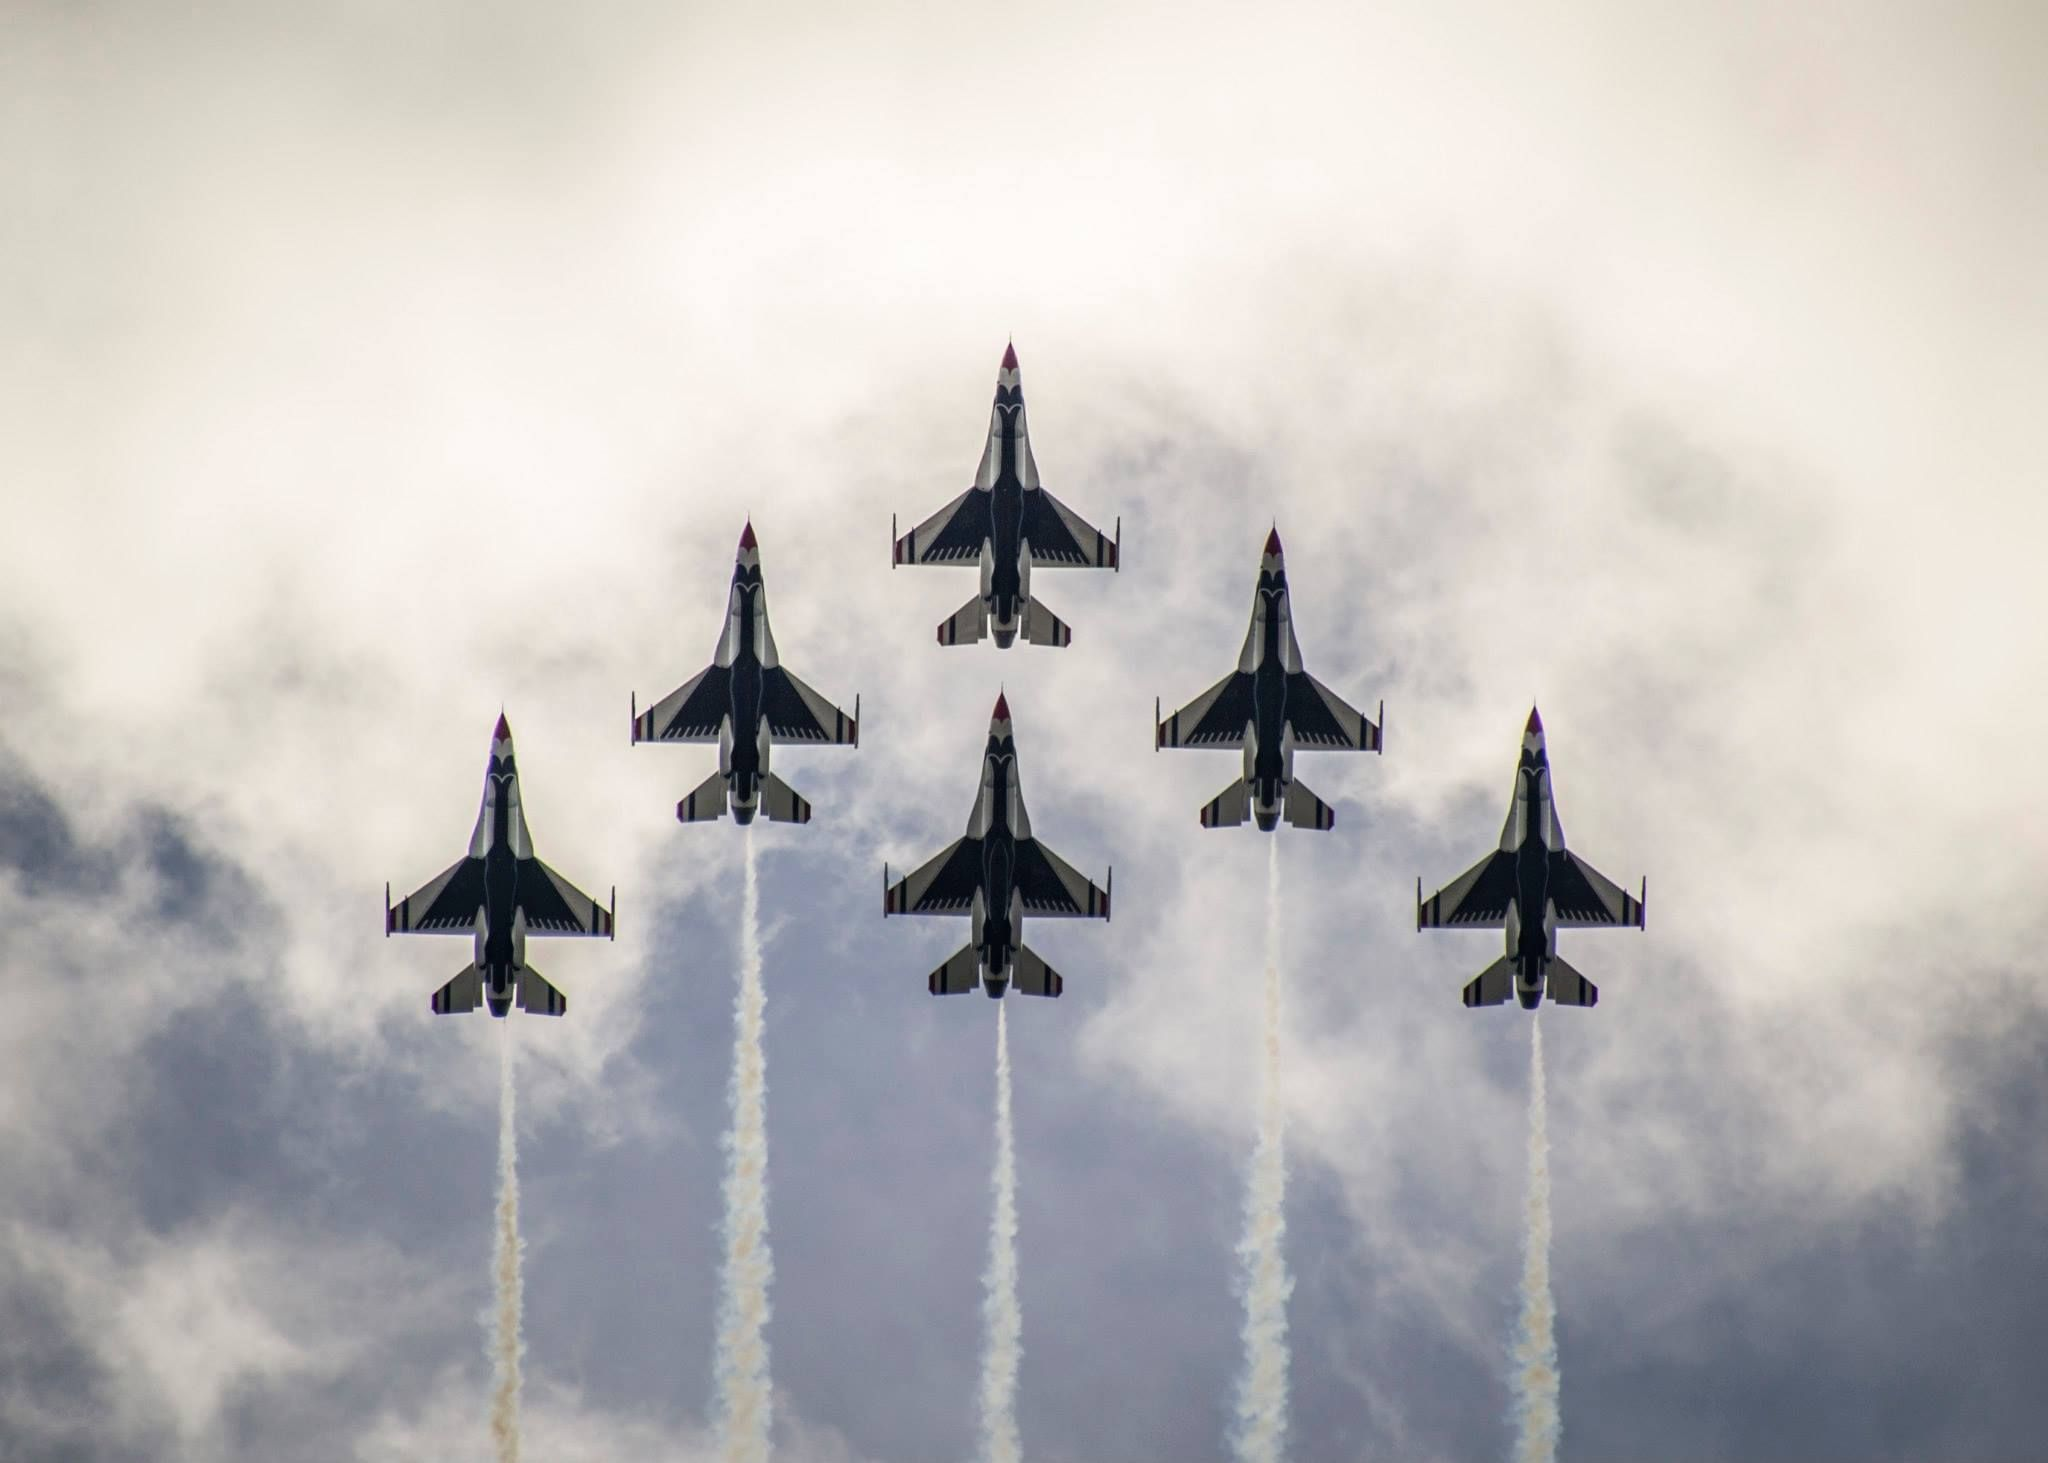 The Thunderbirds Delta Formation flies over Daytona